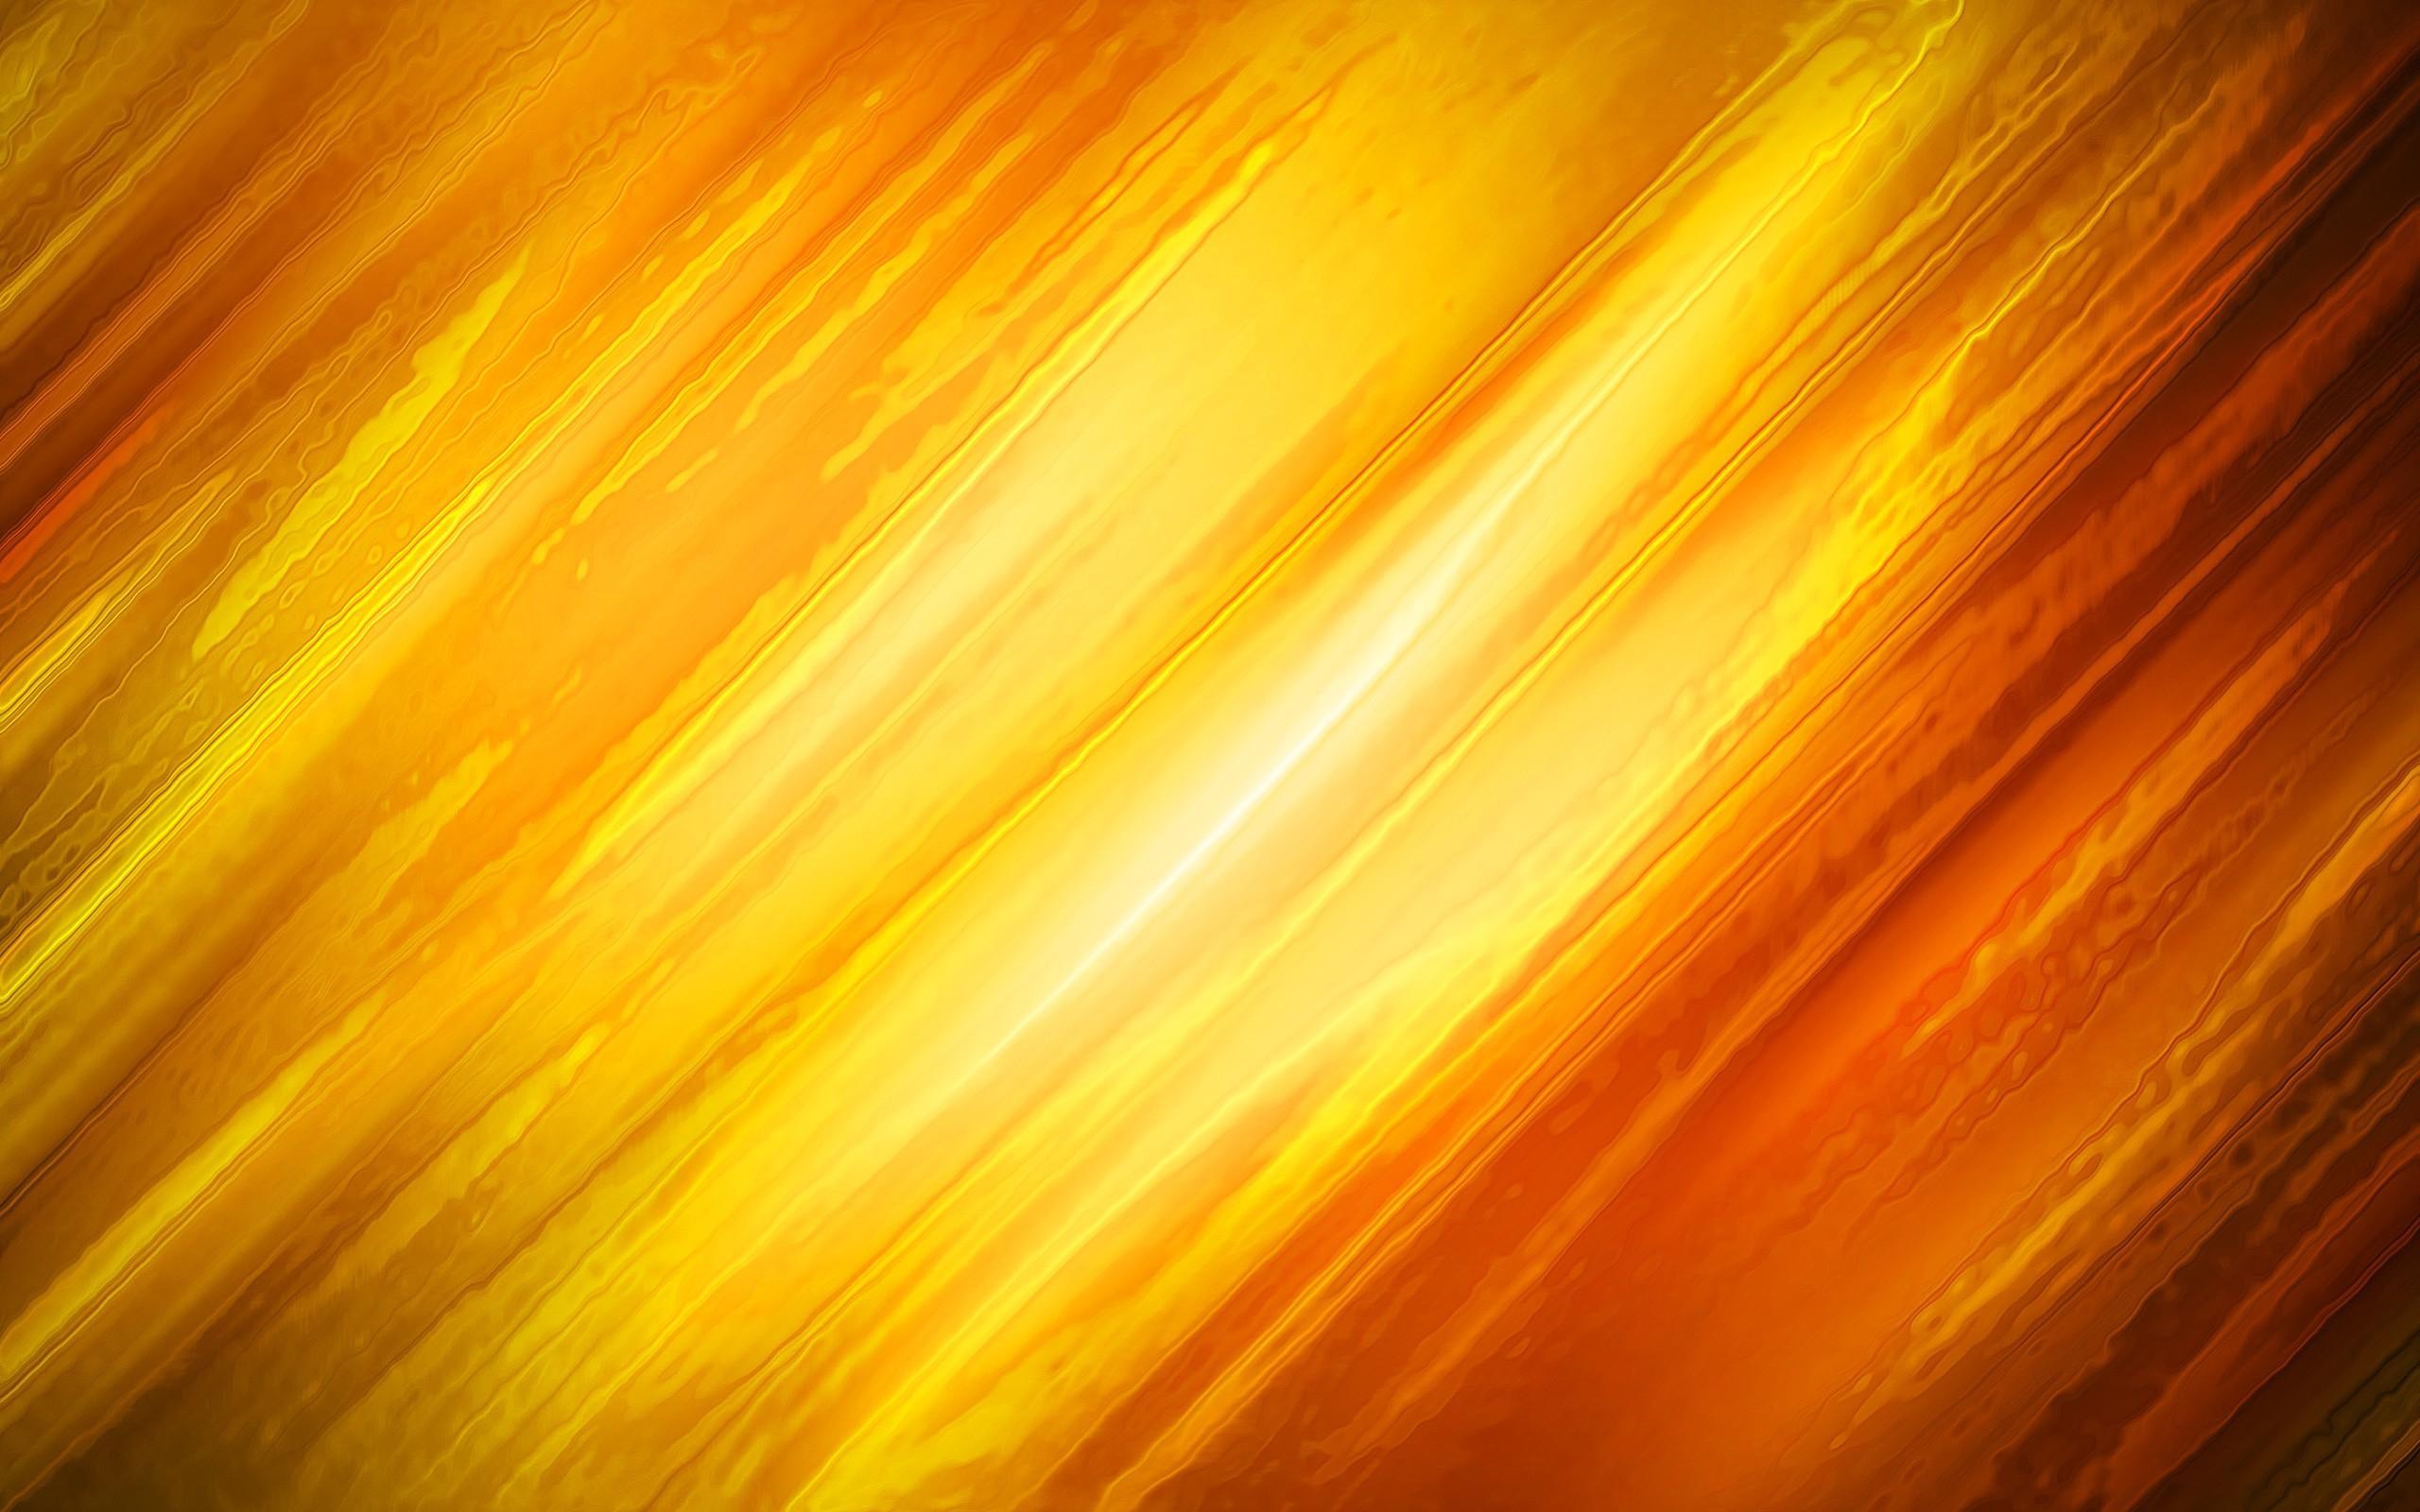 resumen-fondo-amarillo-y-naranja-wallpapers_35310_2560x1600